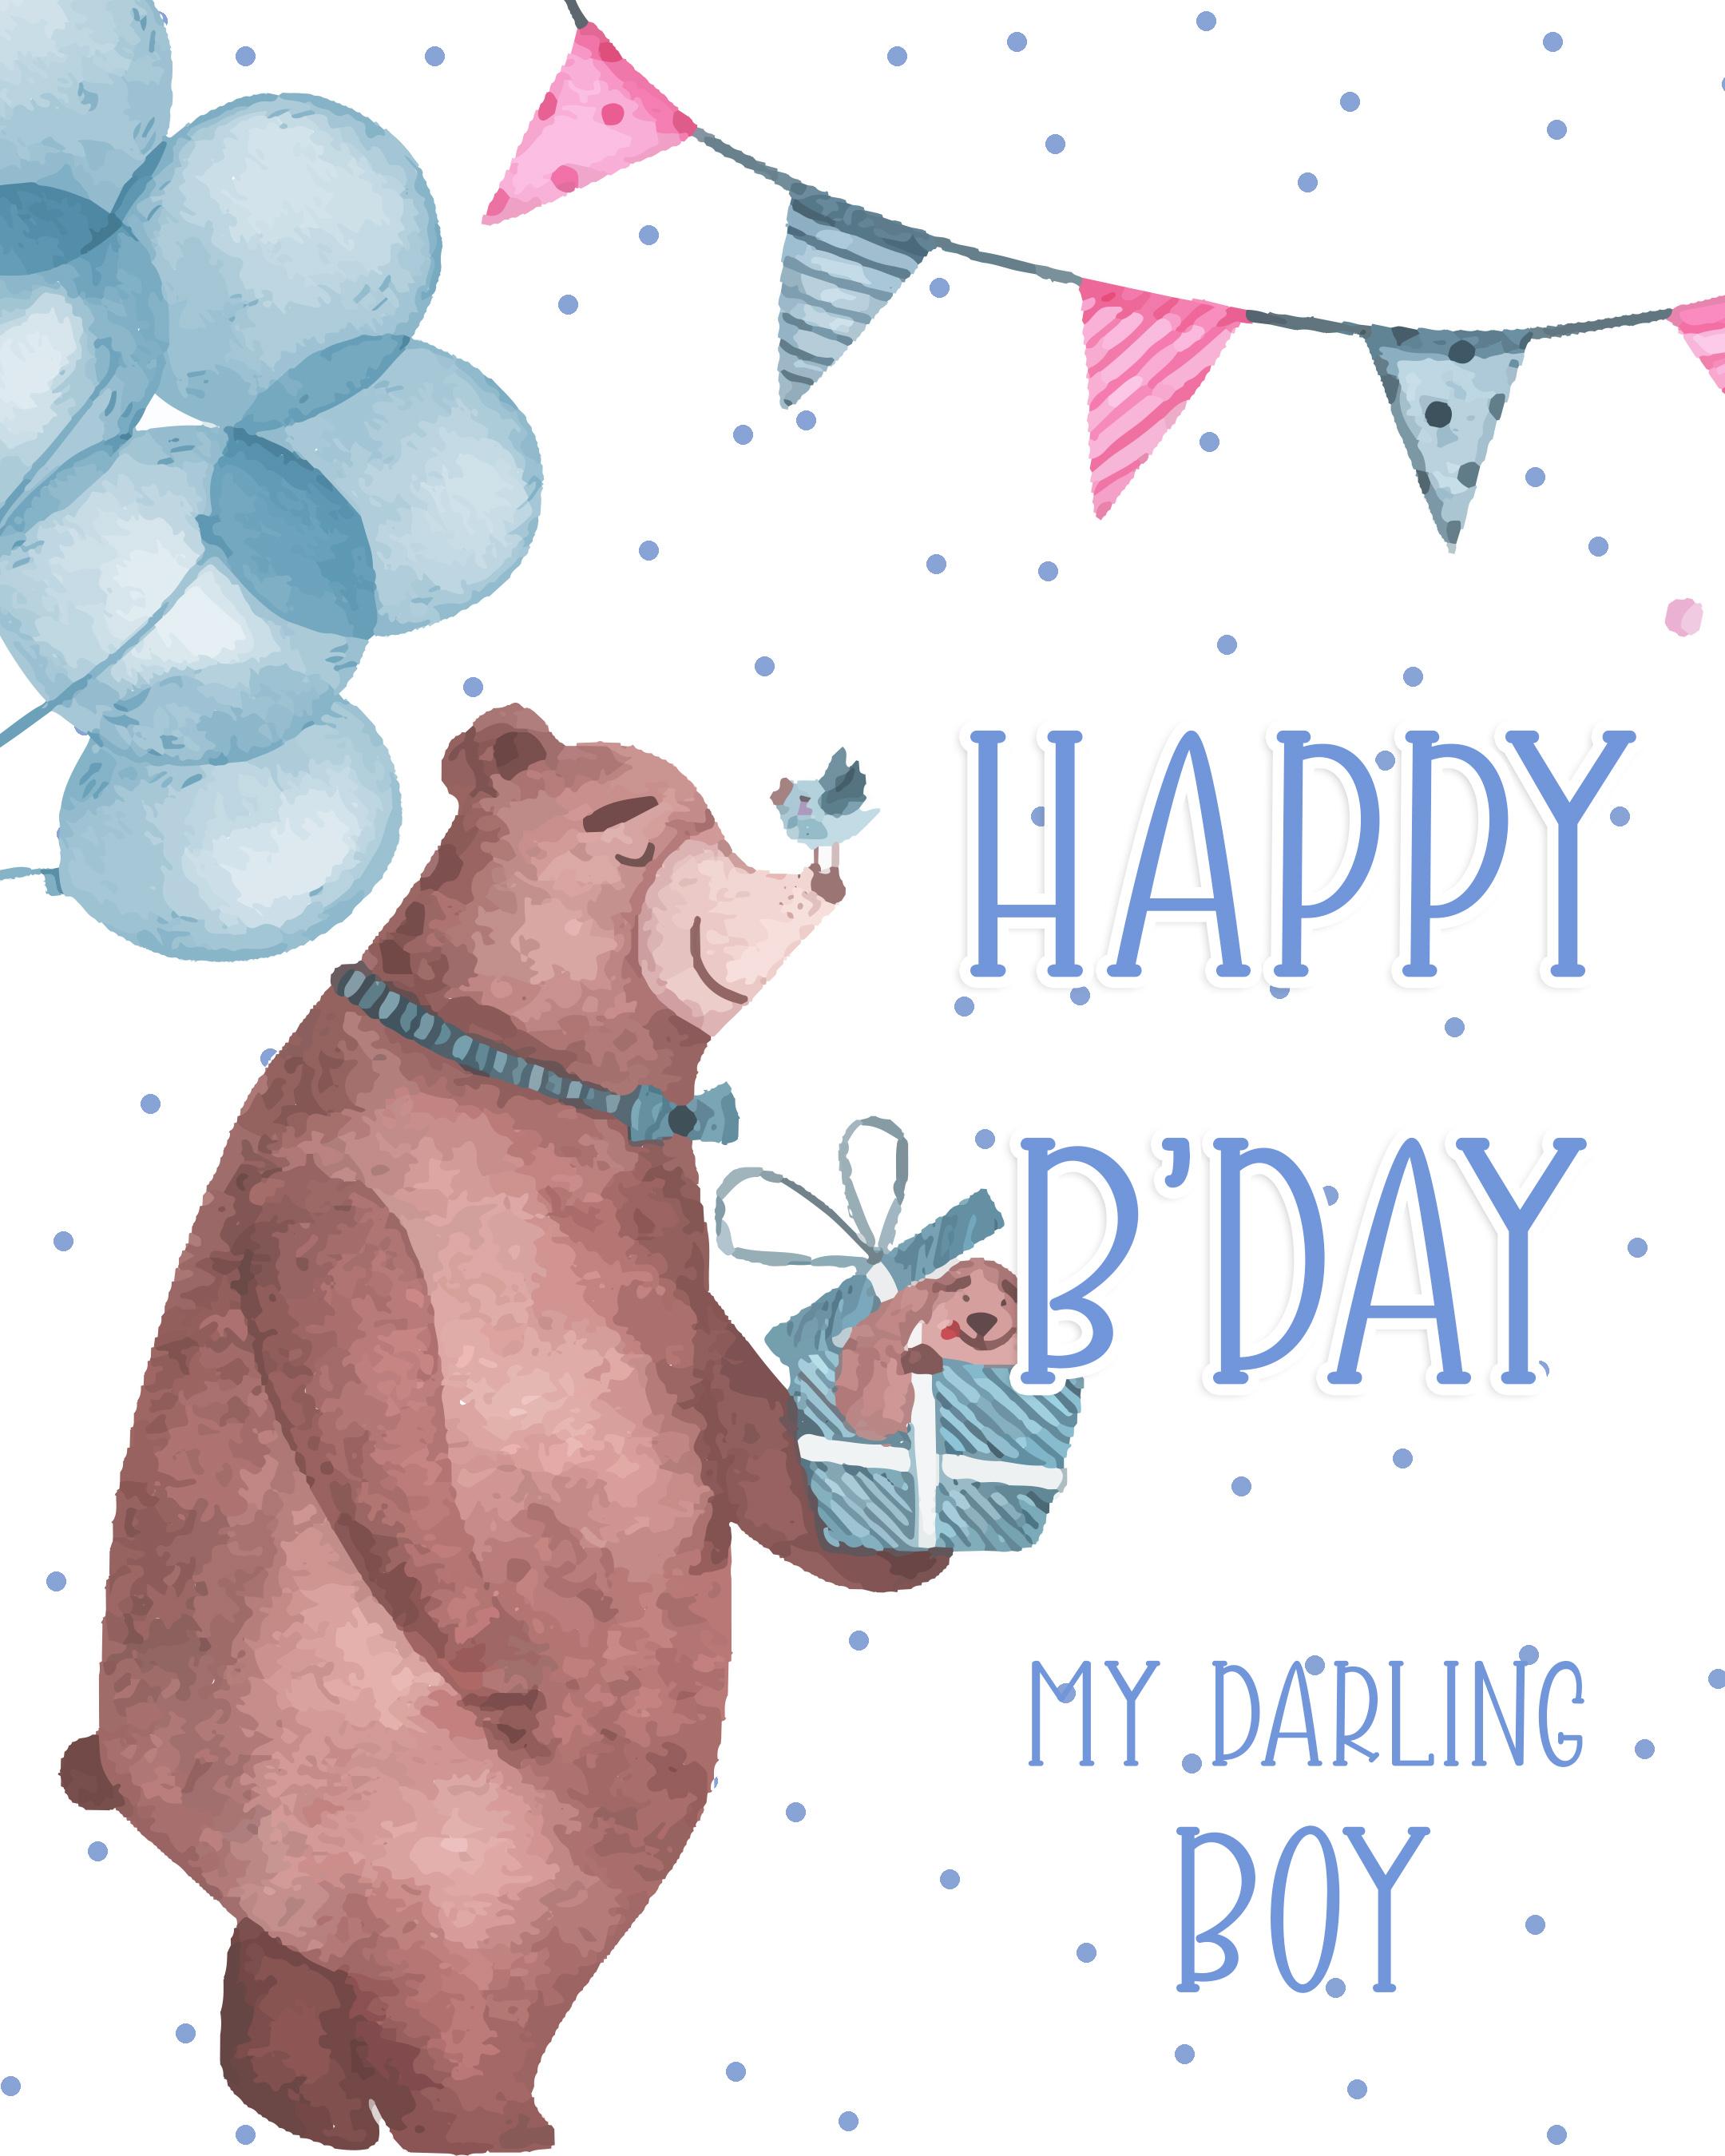 Free Happy Birthday Image For Boy With Bear - birthdayimg.com